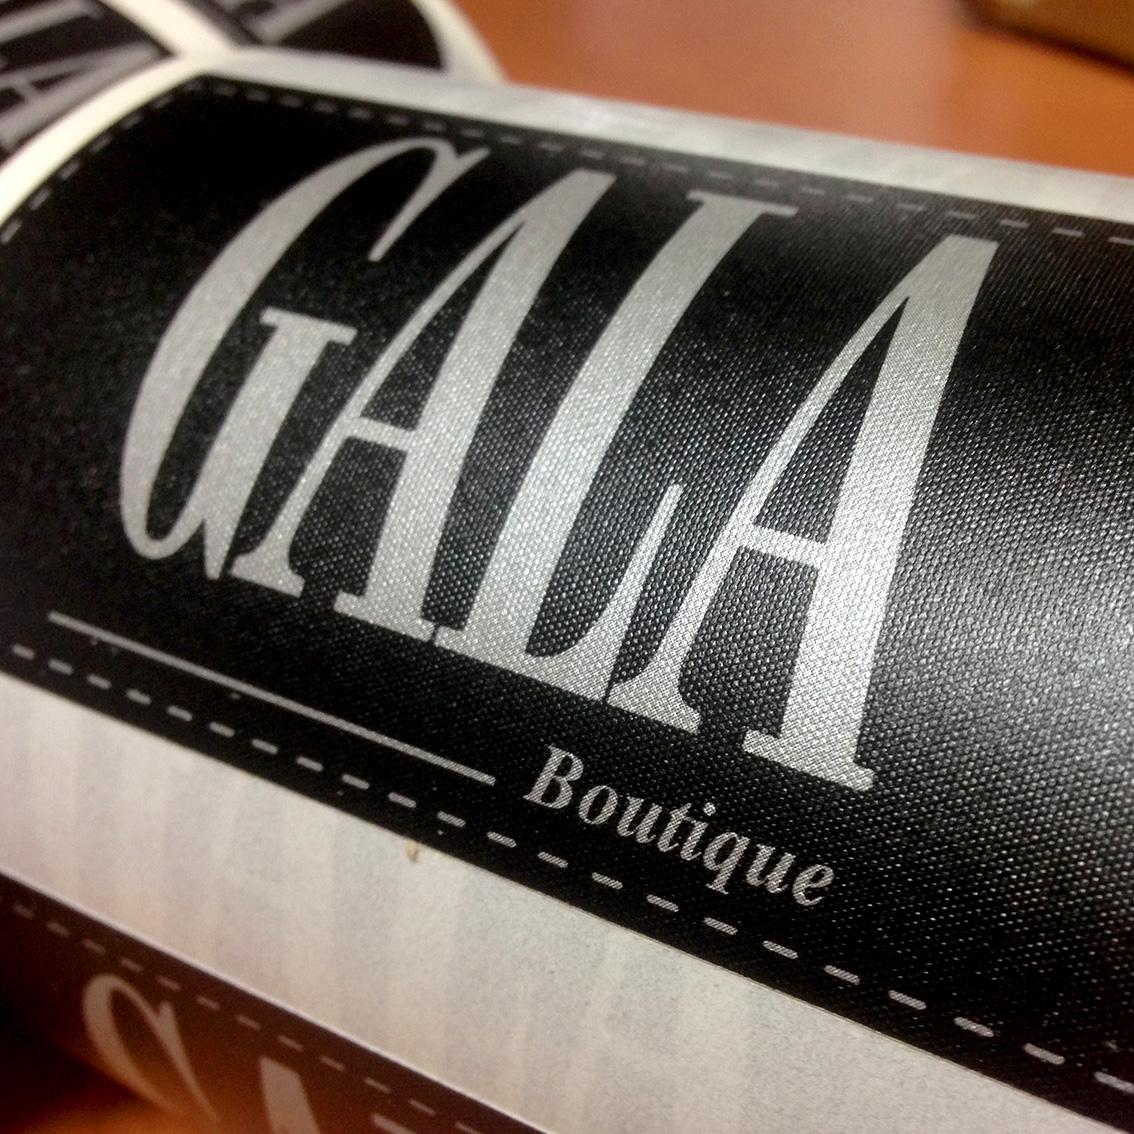 etiquetas personalizadas en bobina